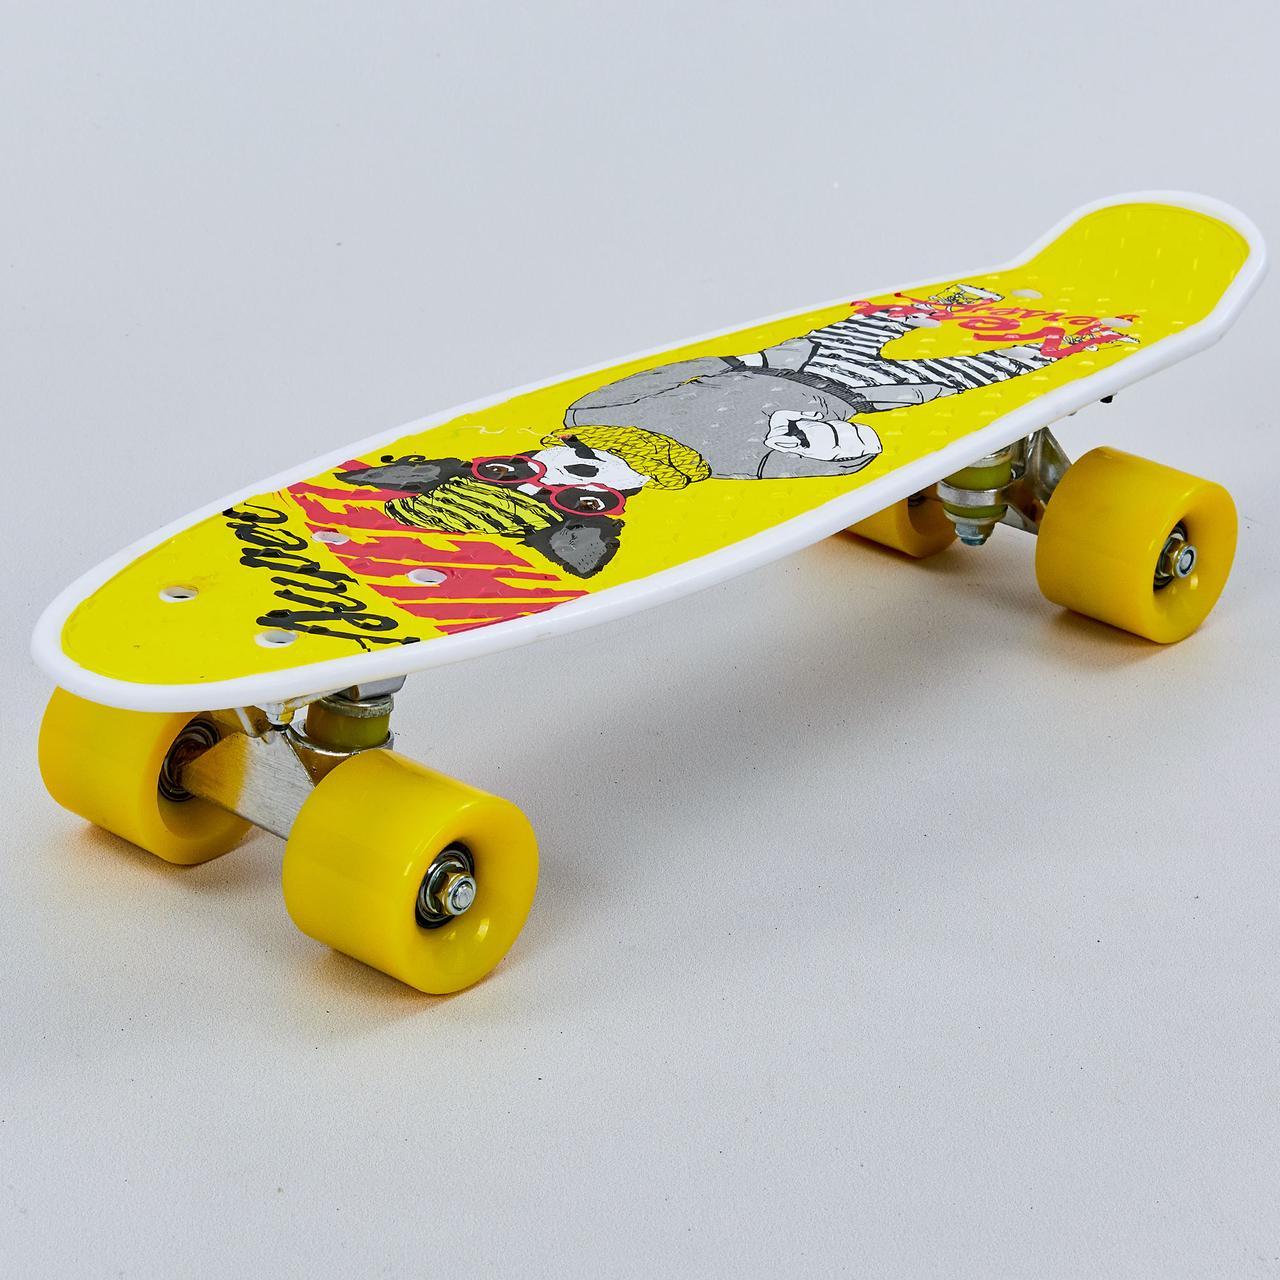 Скейтборд пластиковый Penny 22in с рисунком СОБАКА (колесо-PU d-6см, р-р деки 55х14,5см, желтый)